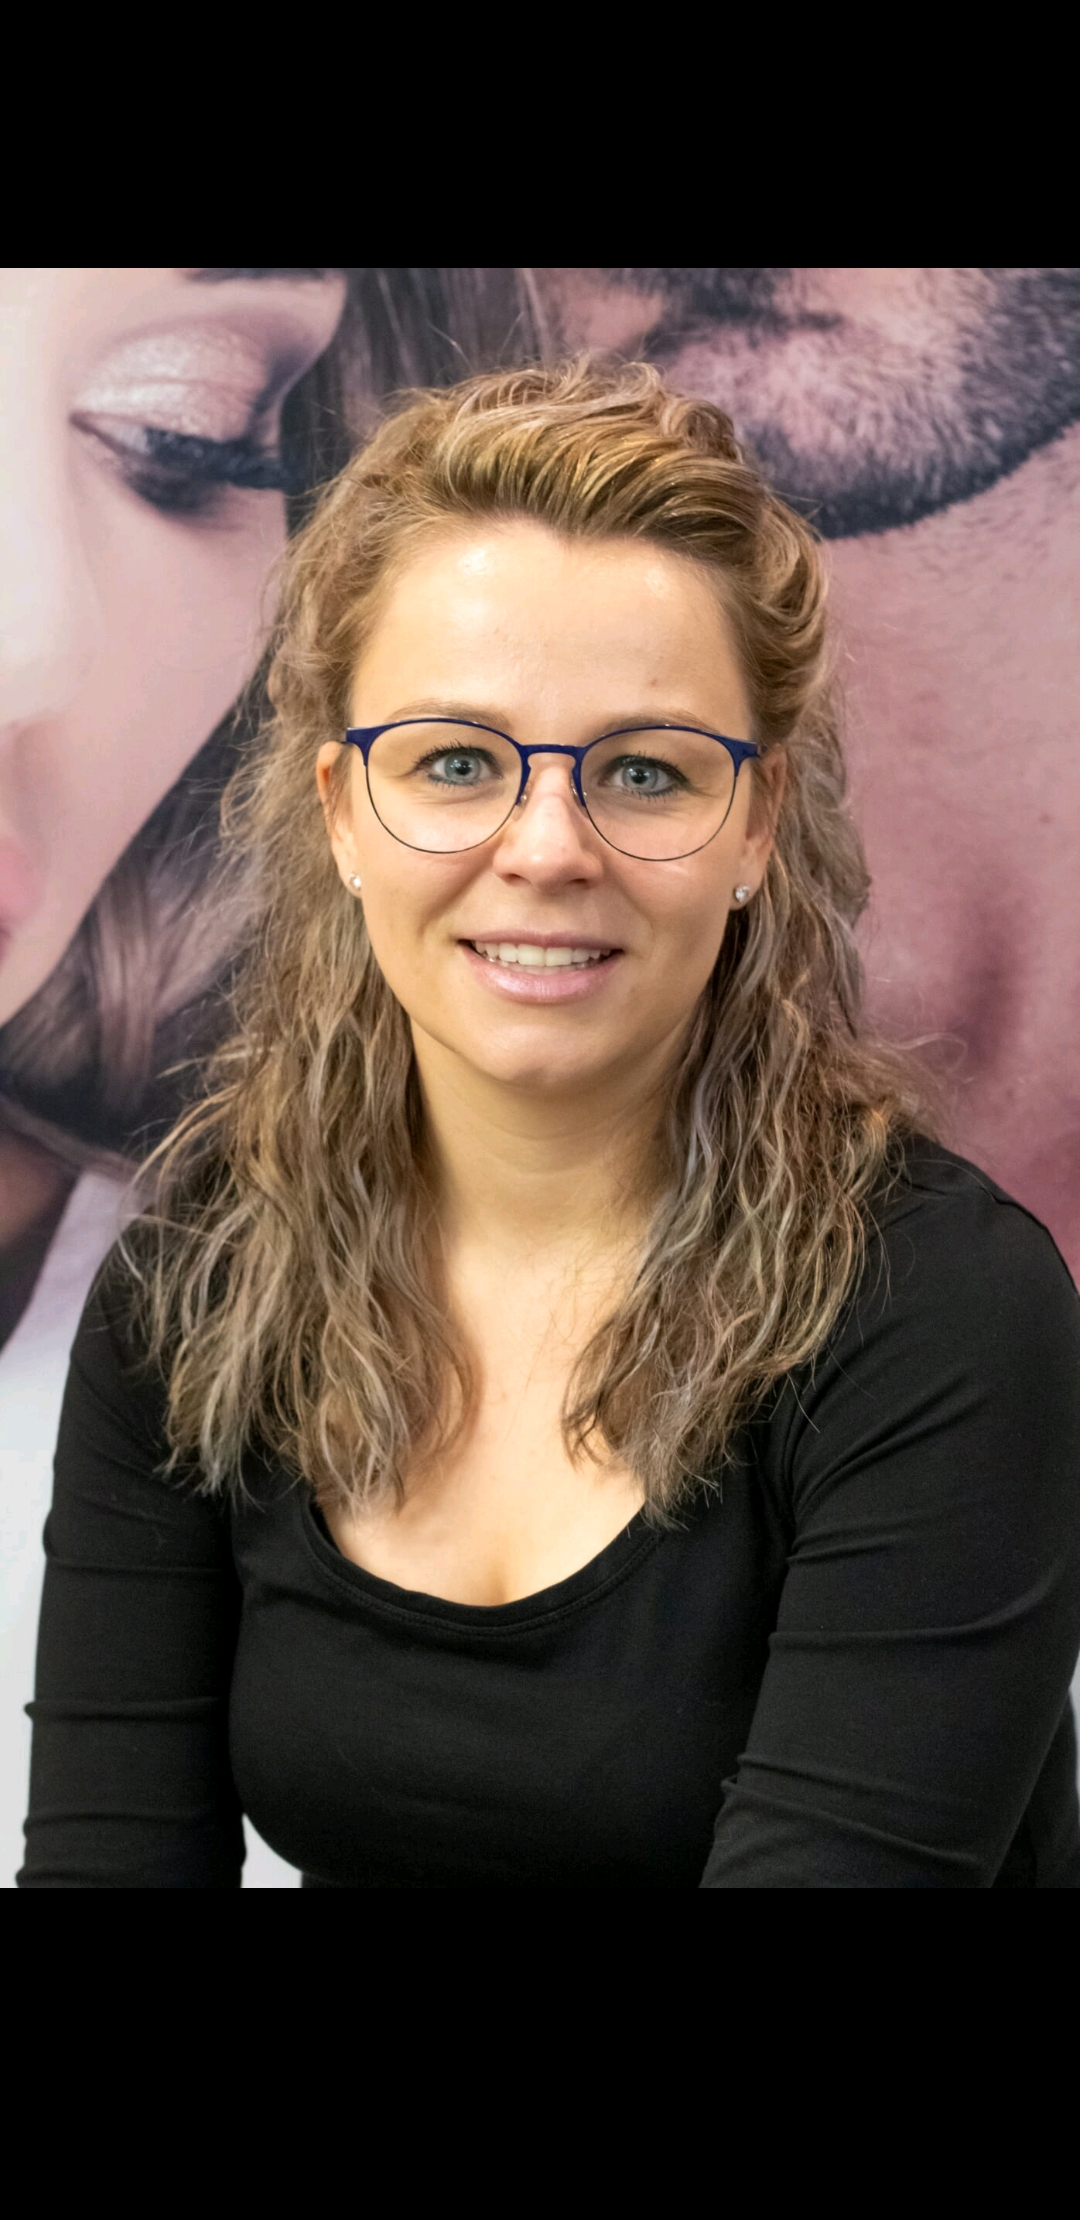 Kelly - Kapper bij Kapsalon Ramon Groesbeek